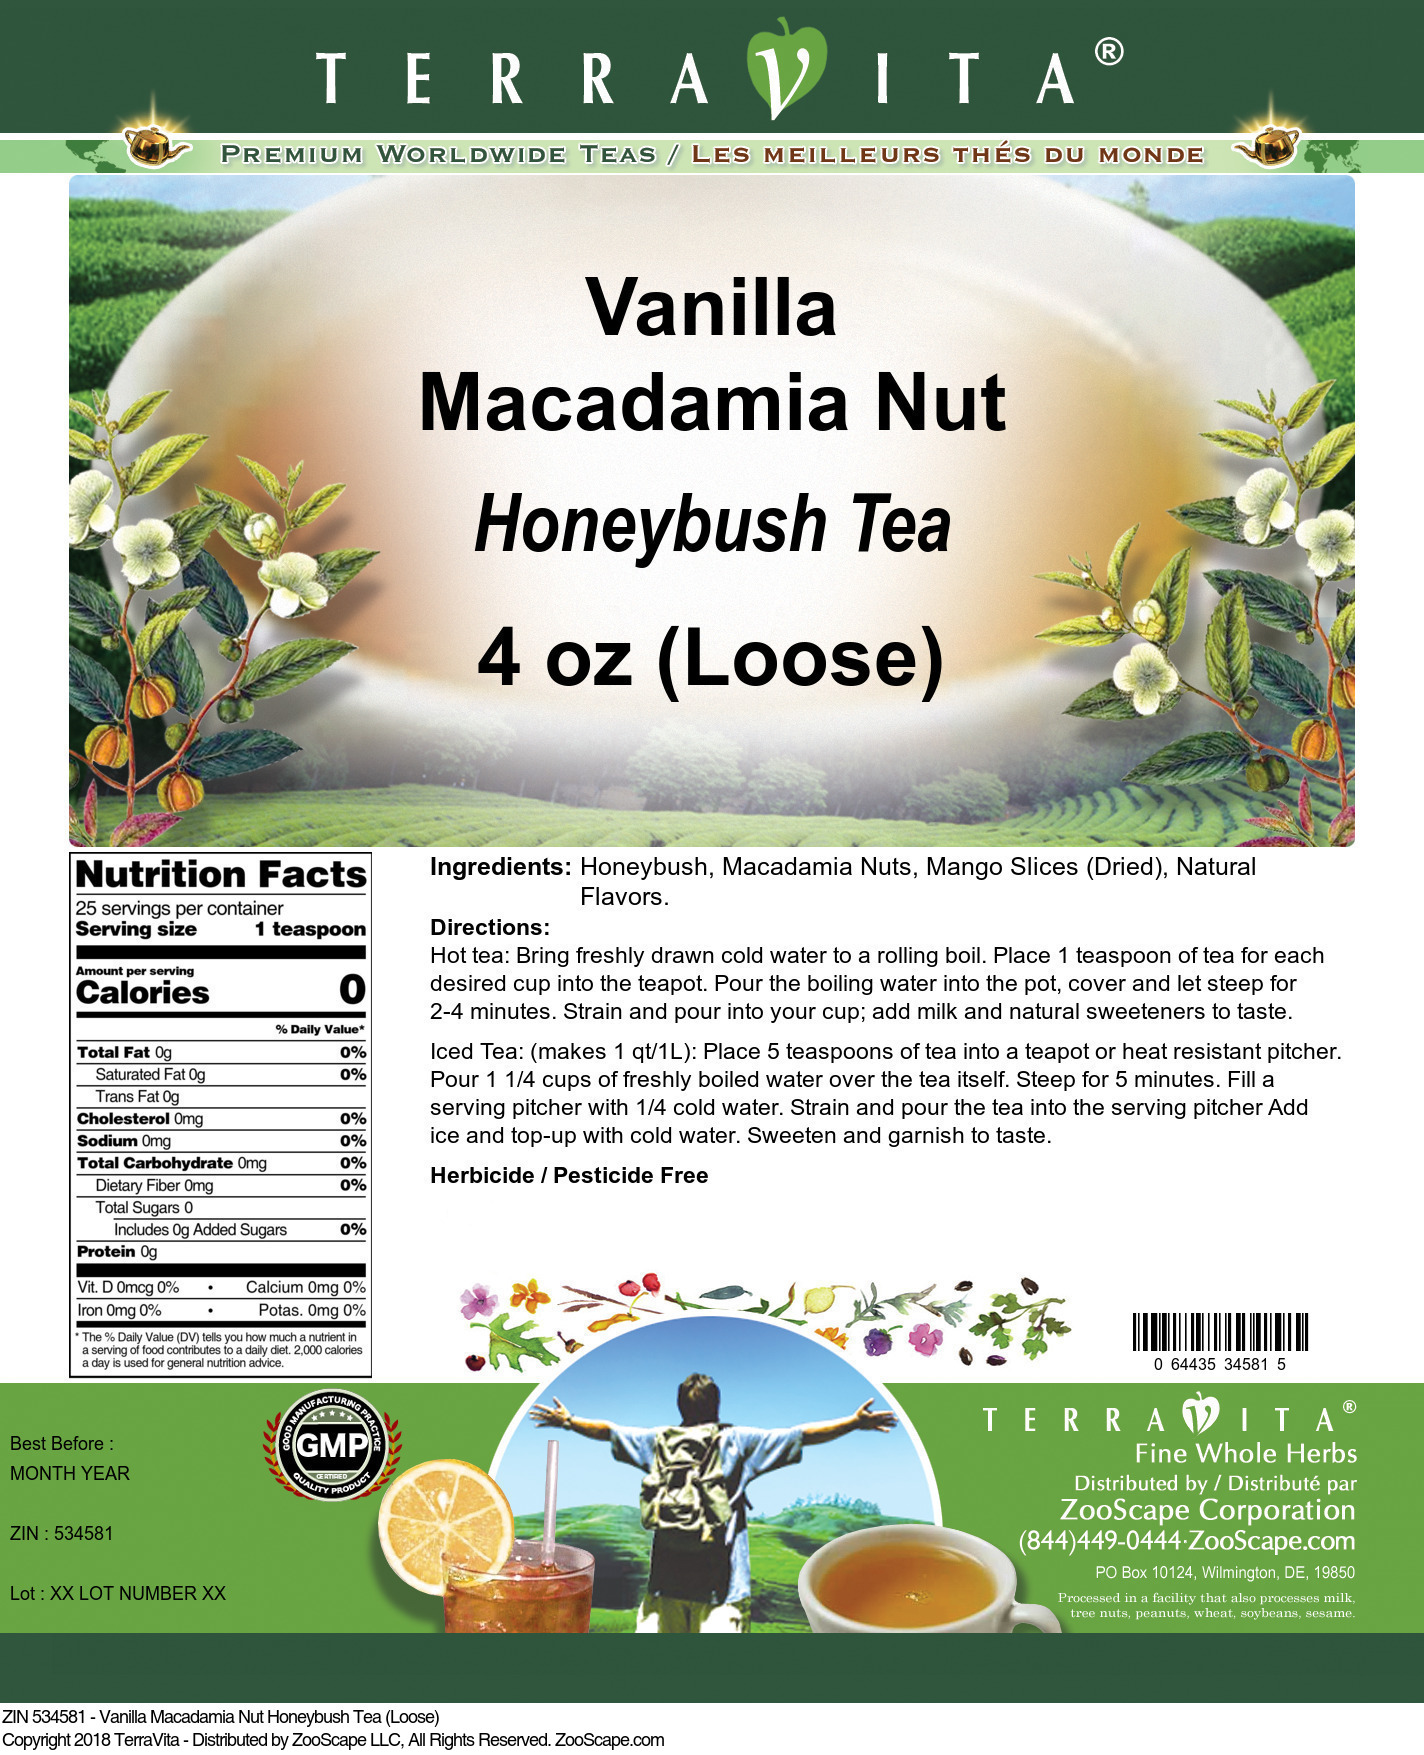 Vanilla Macadamia Nut Honeybush Tea (Loose)